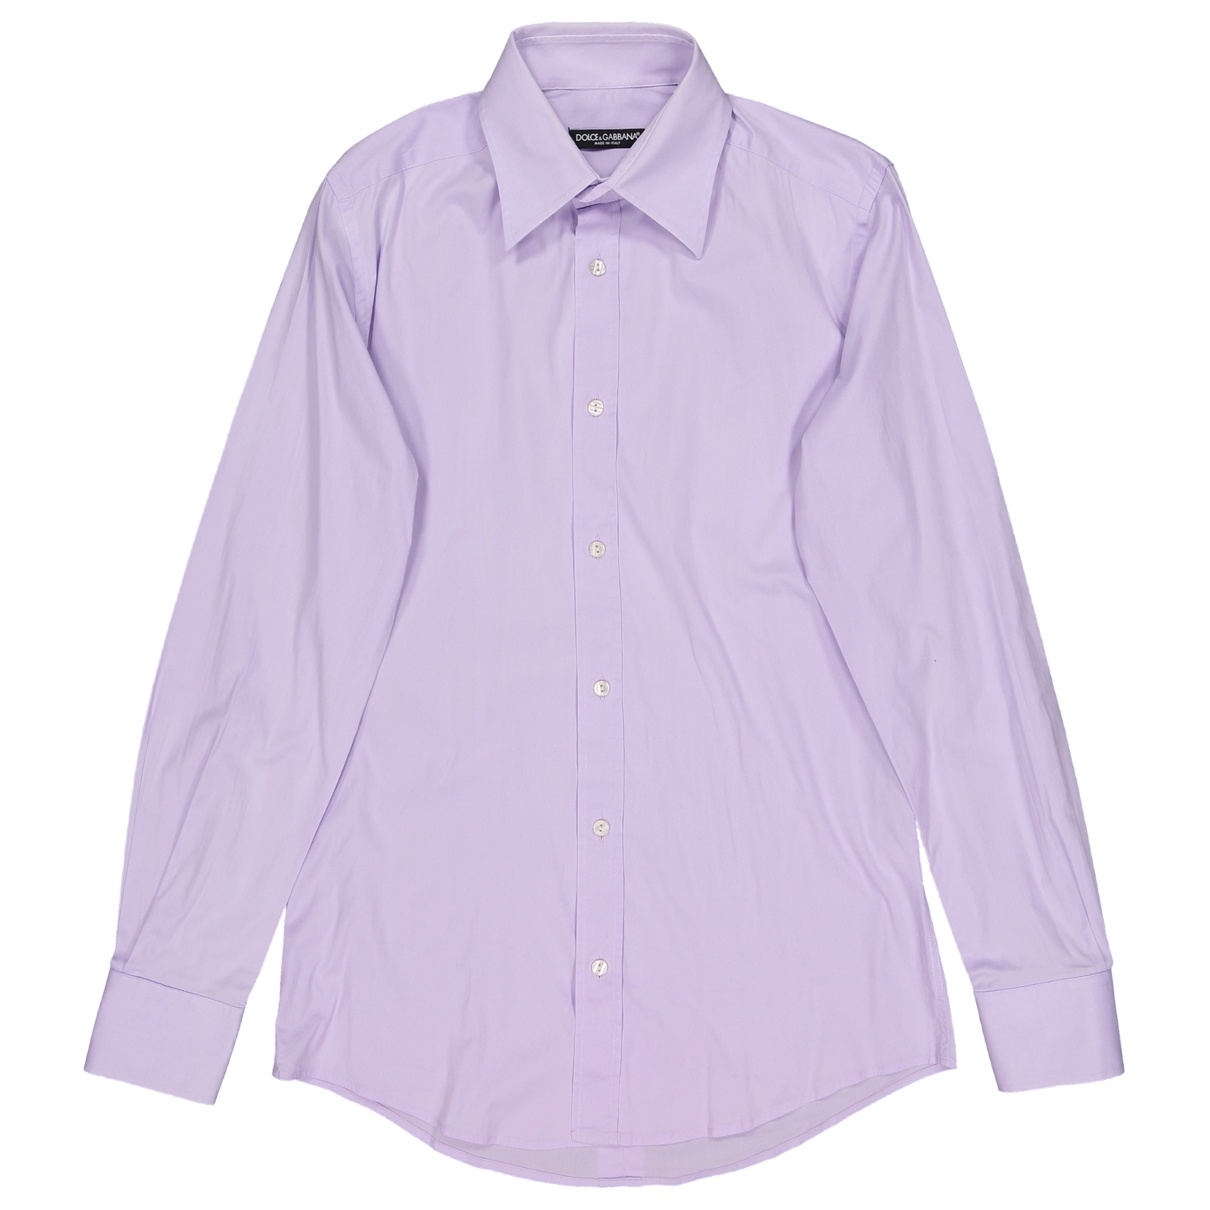 Dolce & Gabbana \N Hemden in  Lila Baumwolle